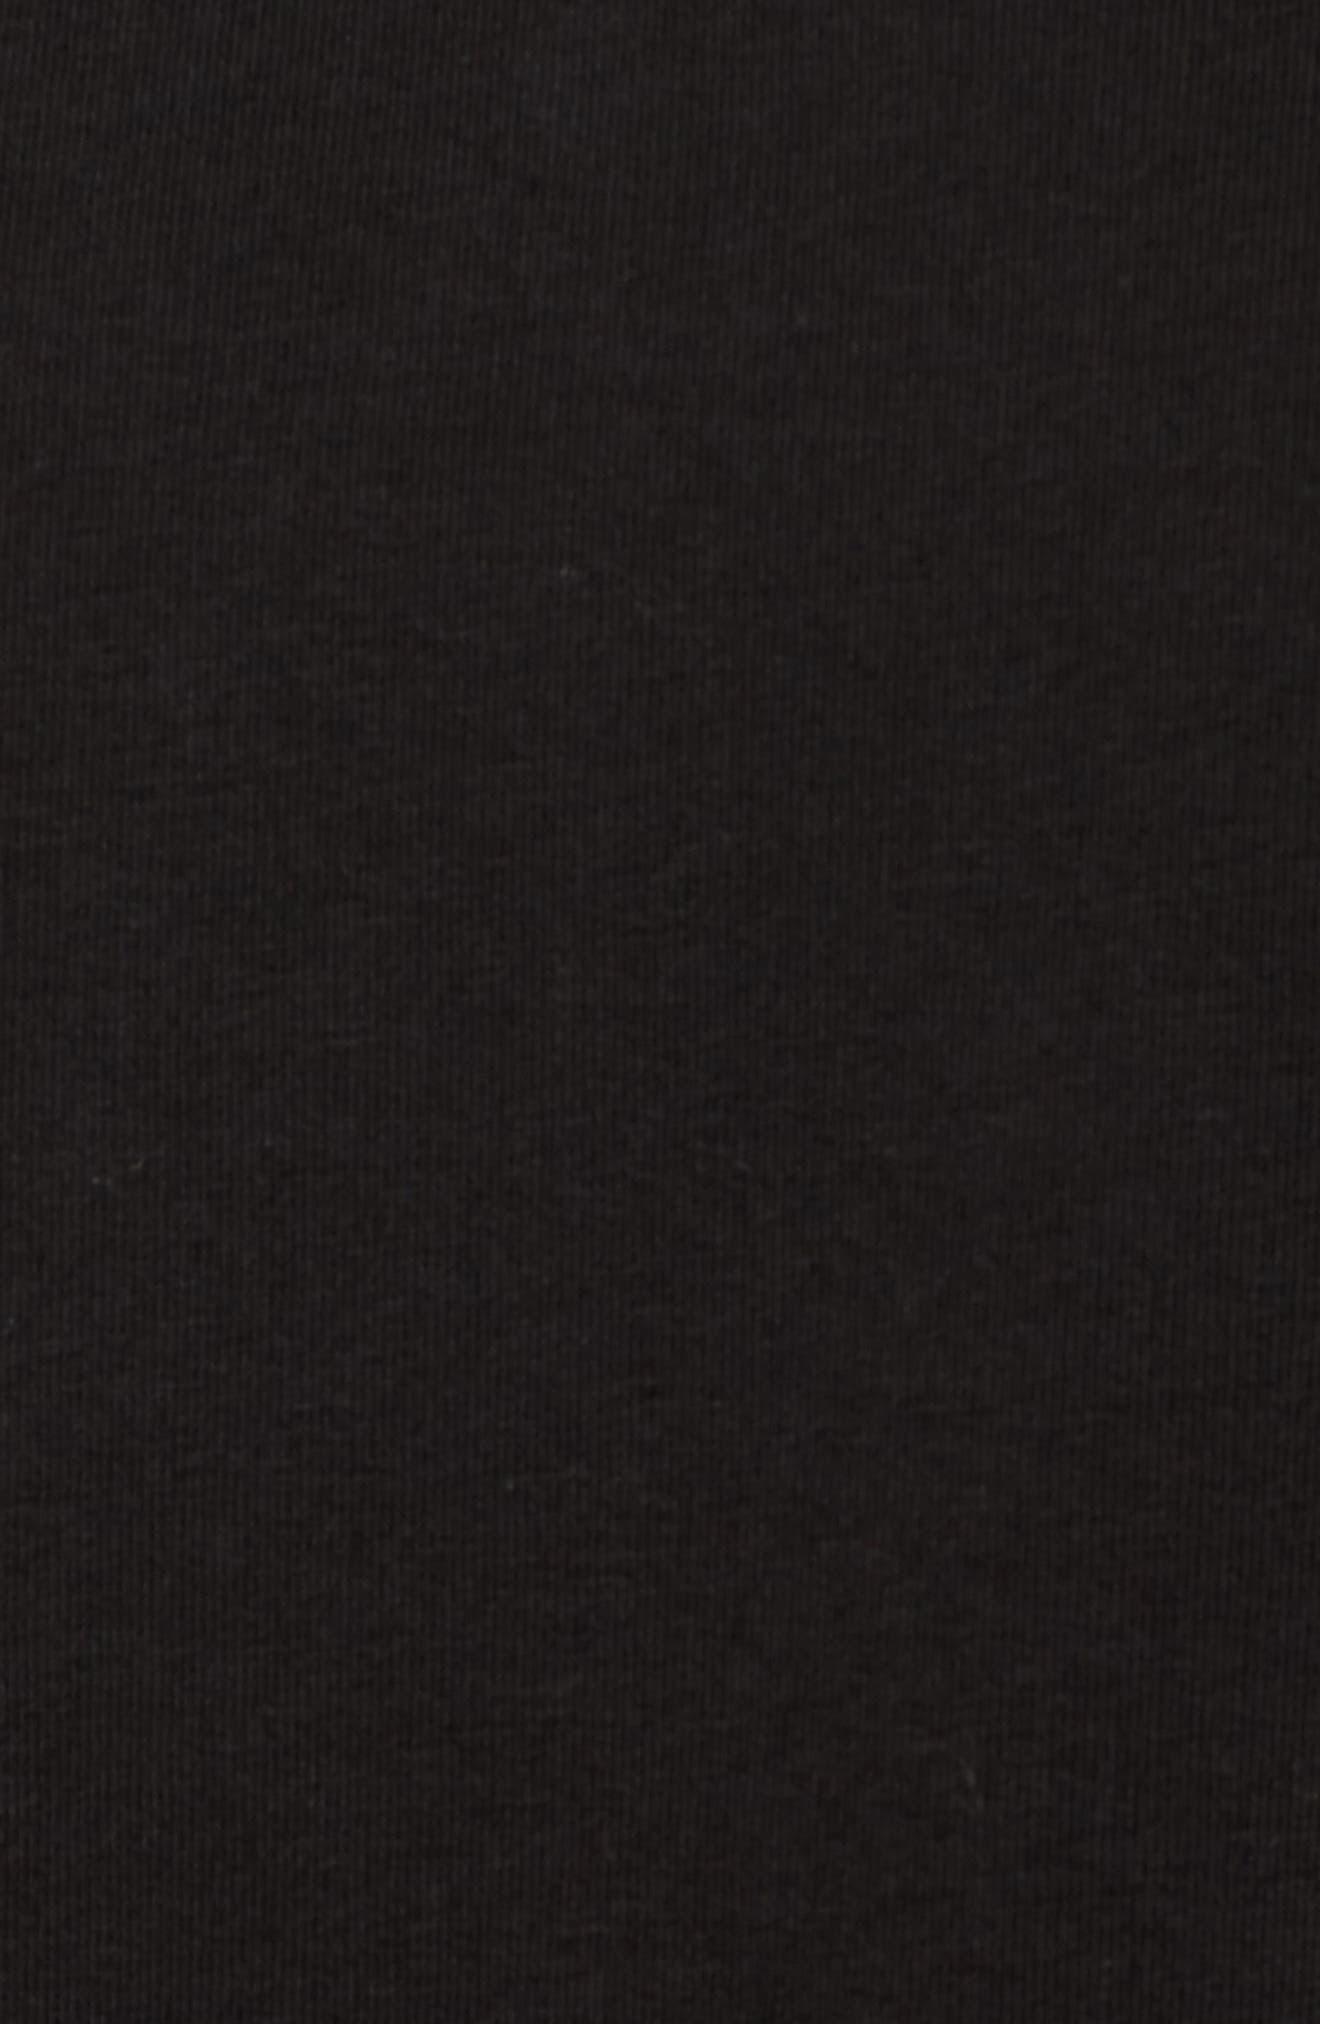 Fleece Panel Sweatshirt,                             Alternate thumbnail 5, color,                             Black